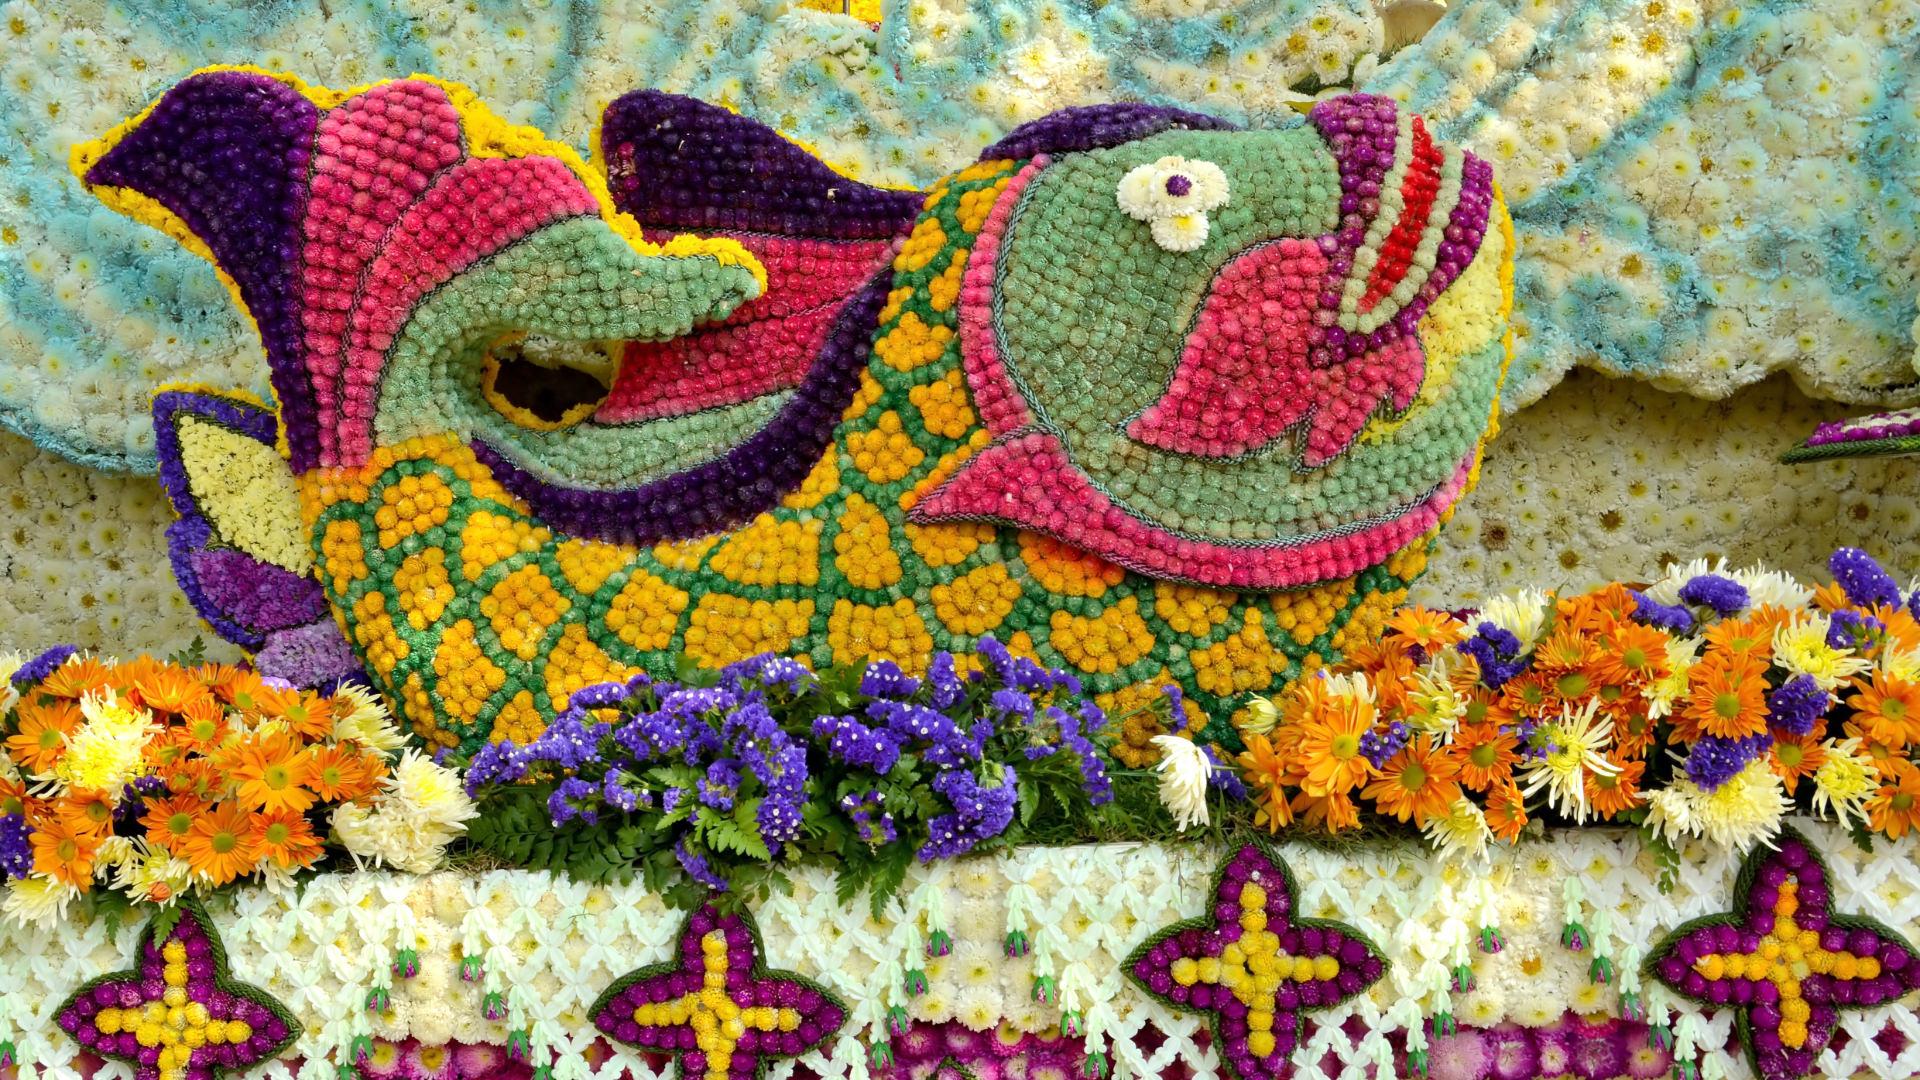 Chiang Mai Çiçek Festivali, Tayland